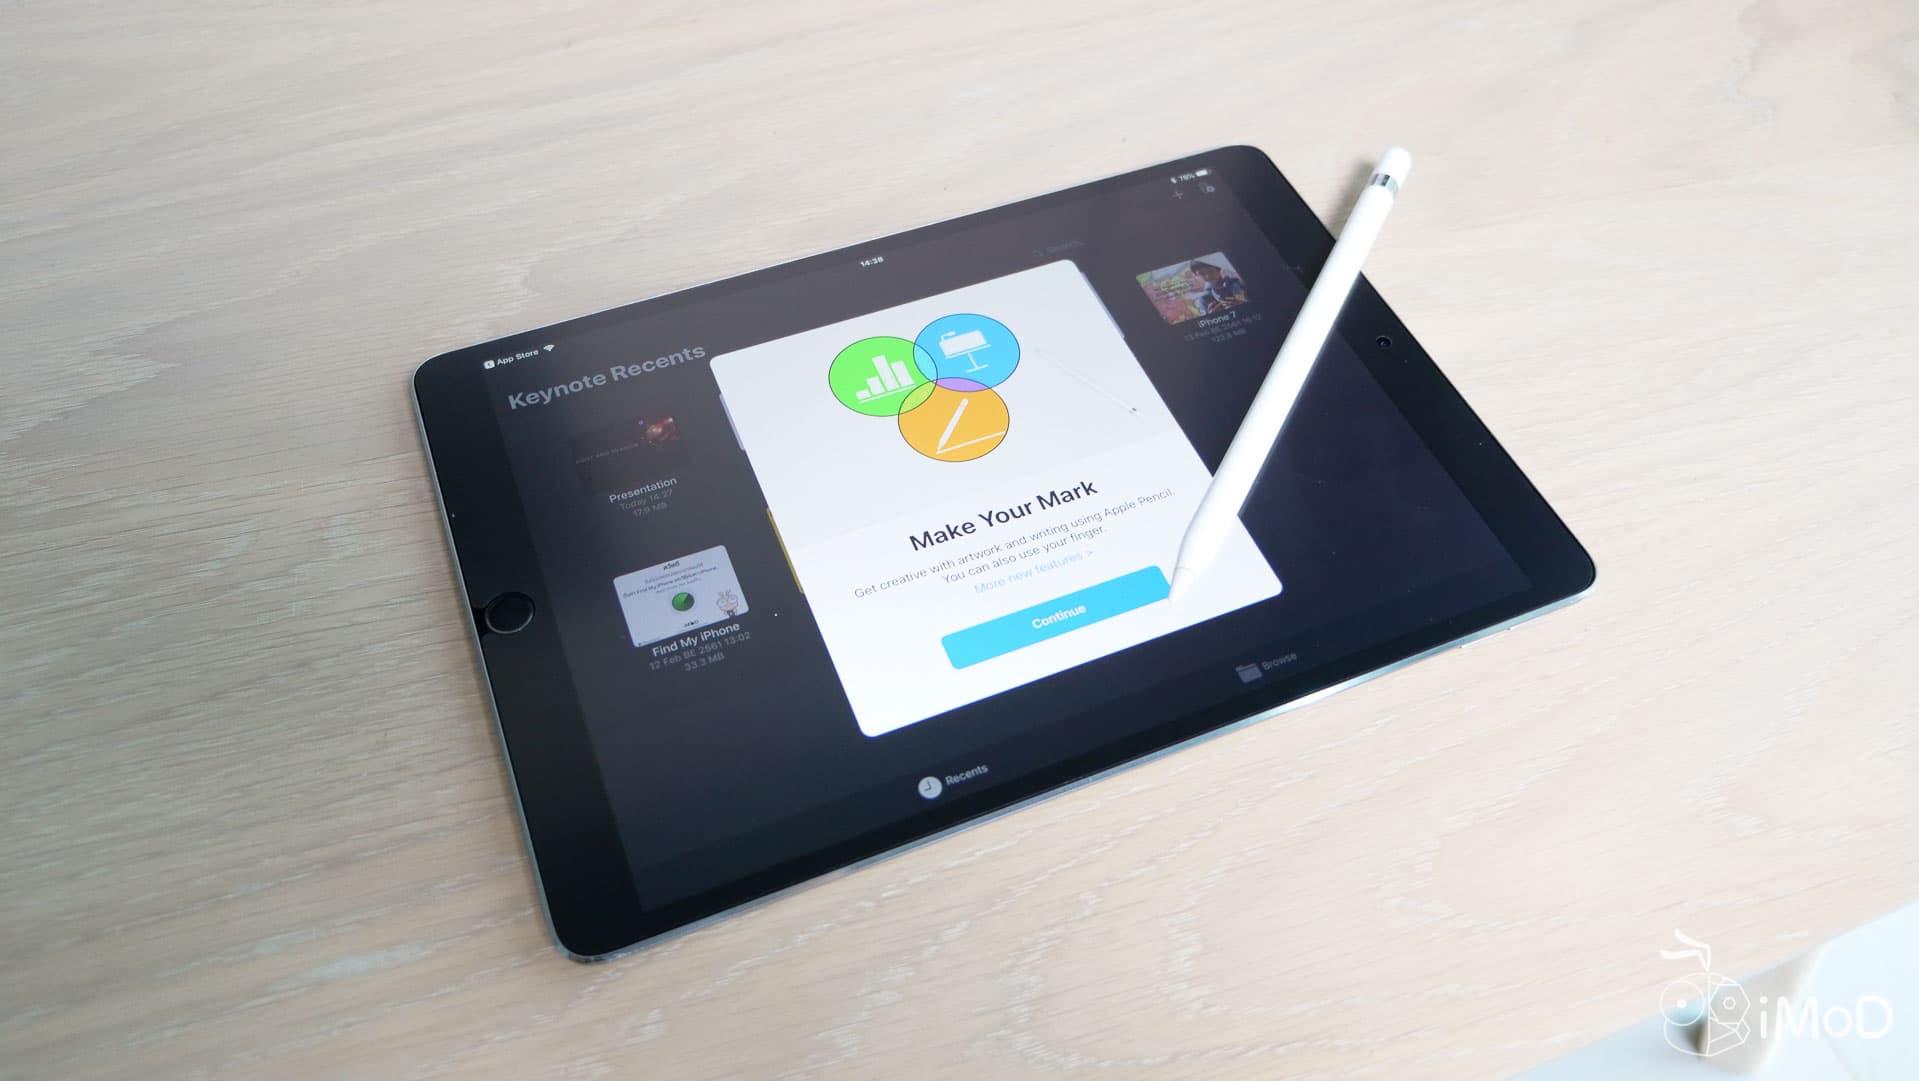 Focus Ipad Pro 10.5 Smart Note 2555